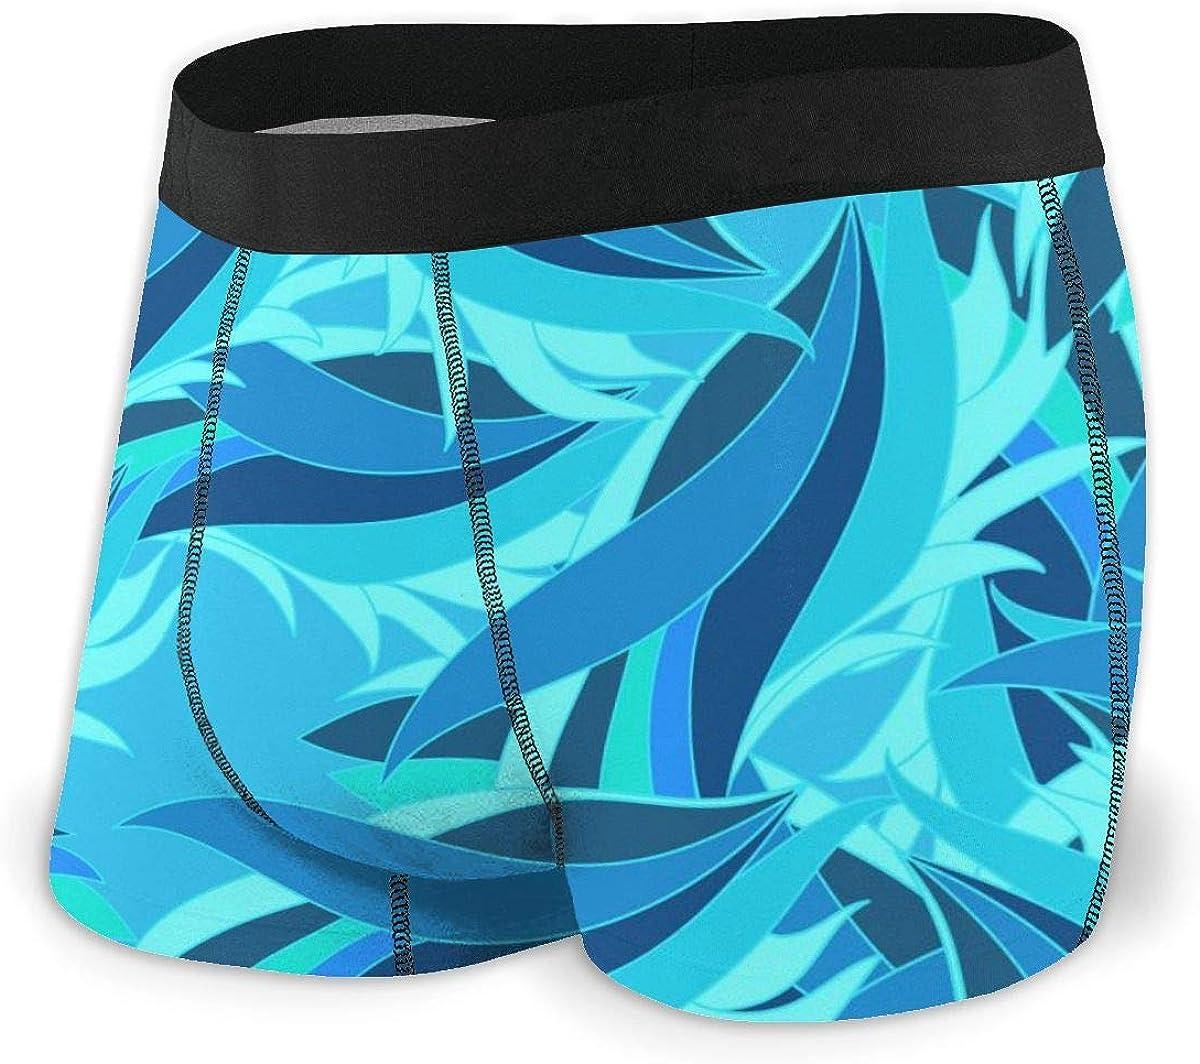 Mens Boxer Briefs Seamless Waves. Boys Trunks Underwear Short Leg Breathable Man